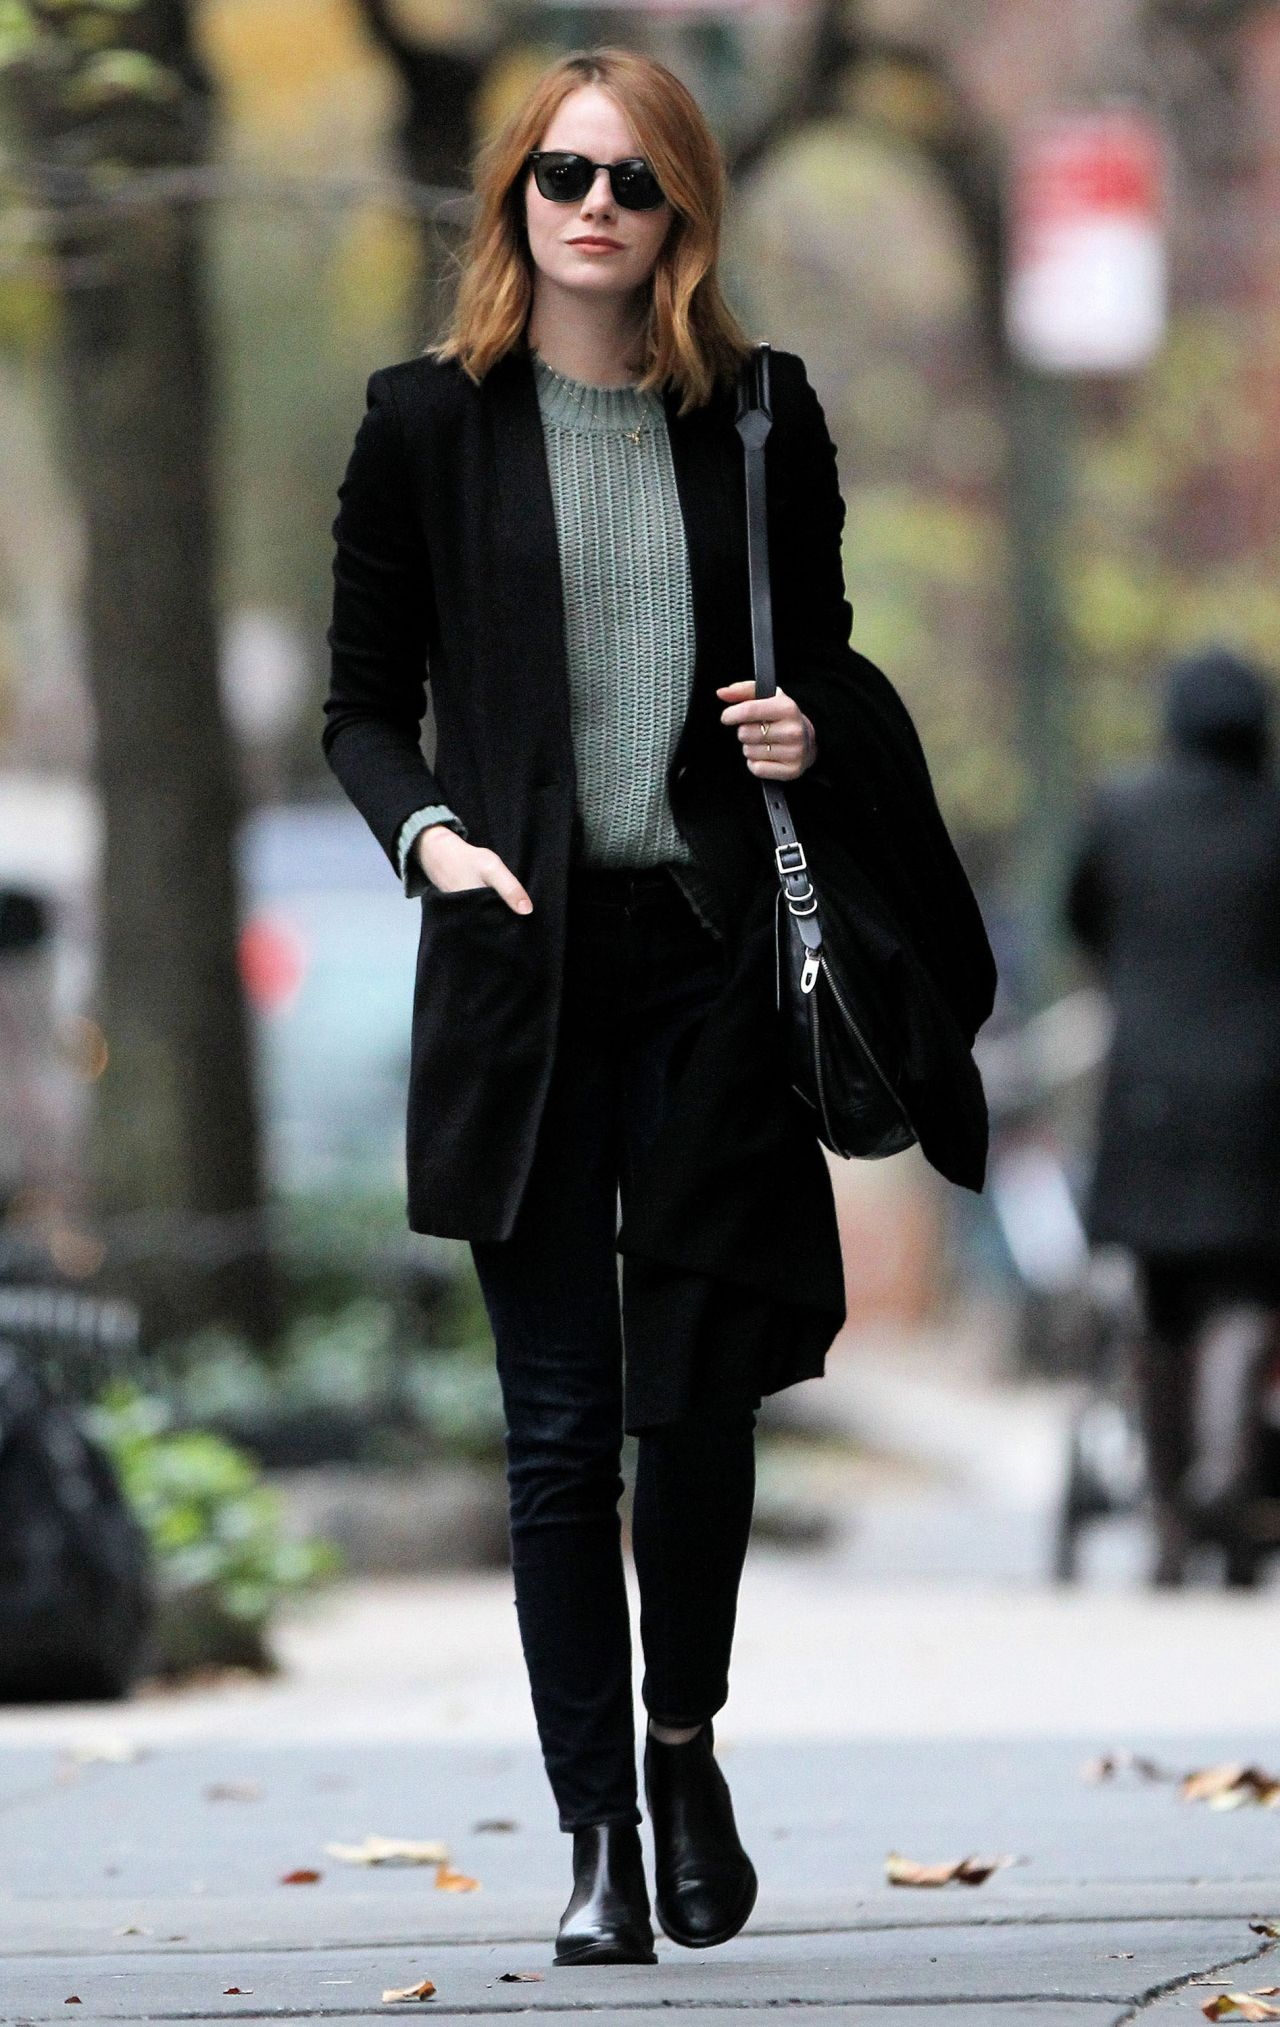 Emma Stone Casual Style New York City 11 18 2015